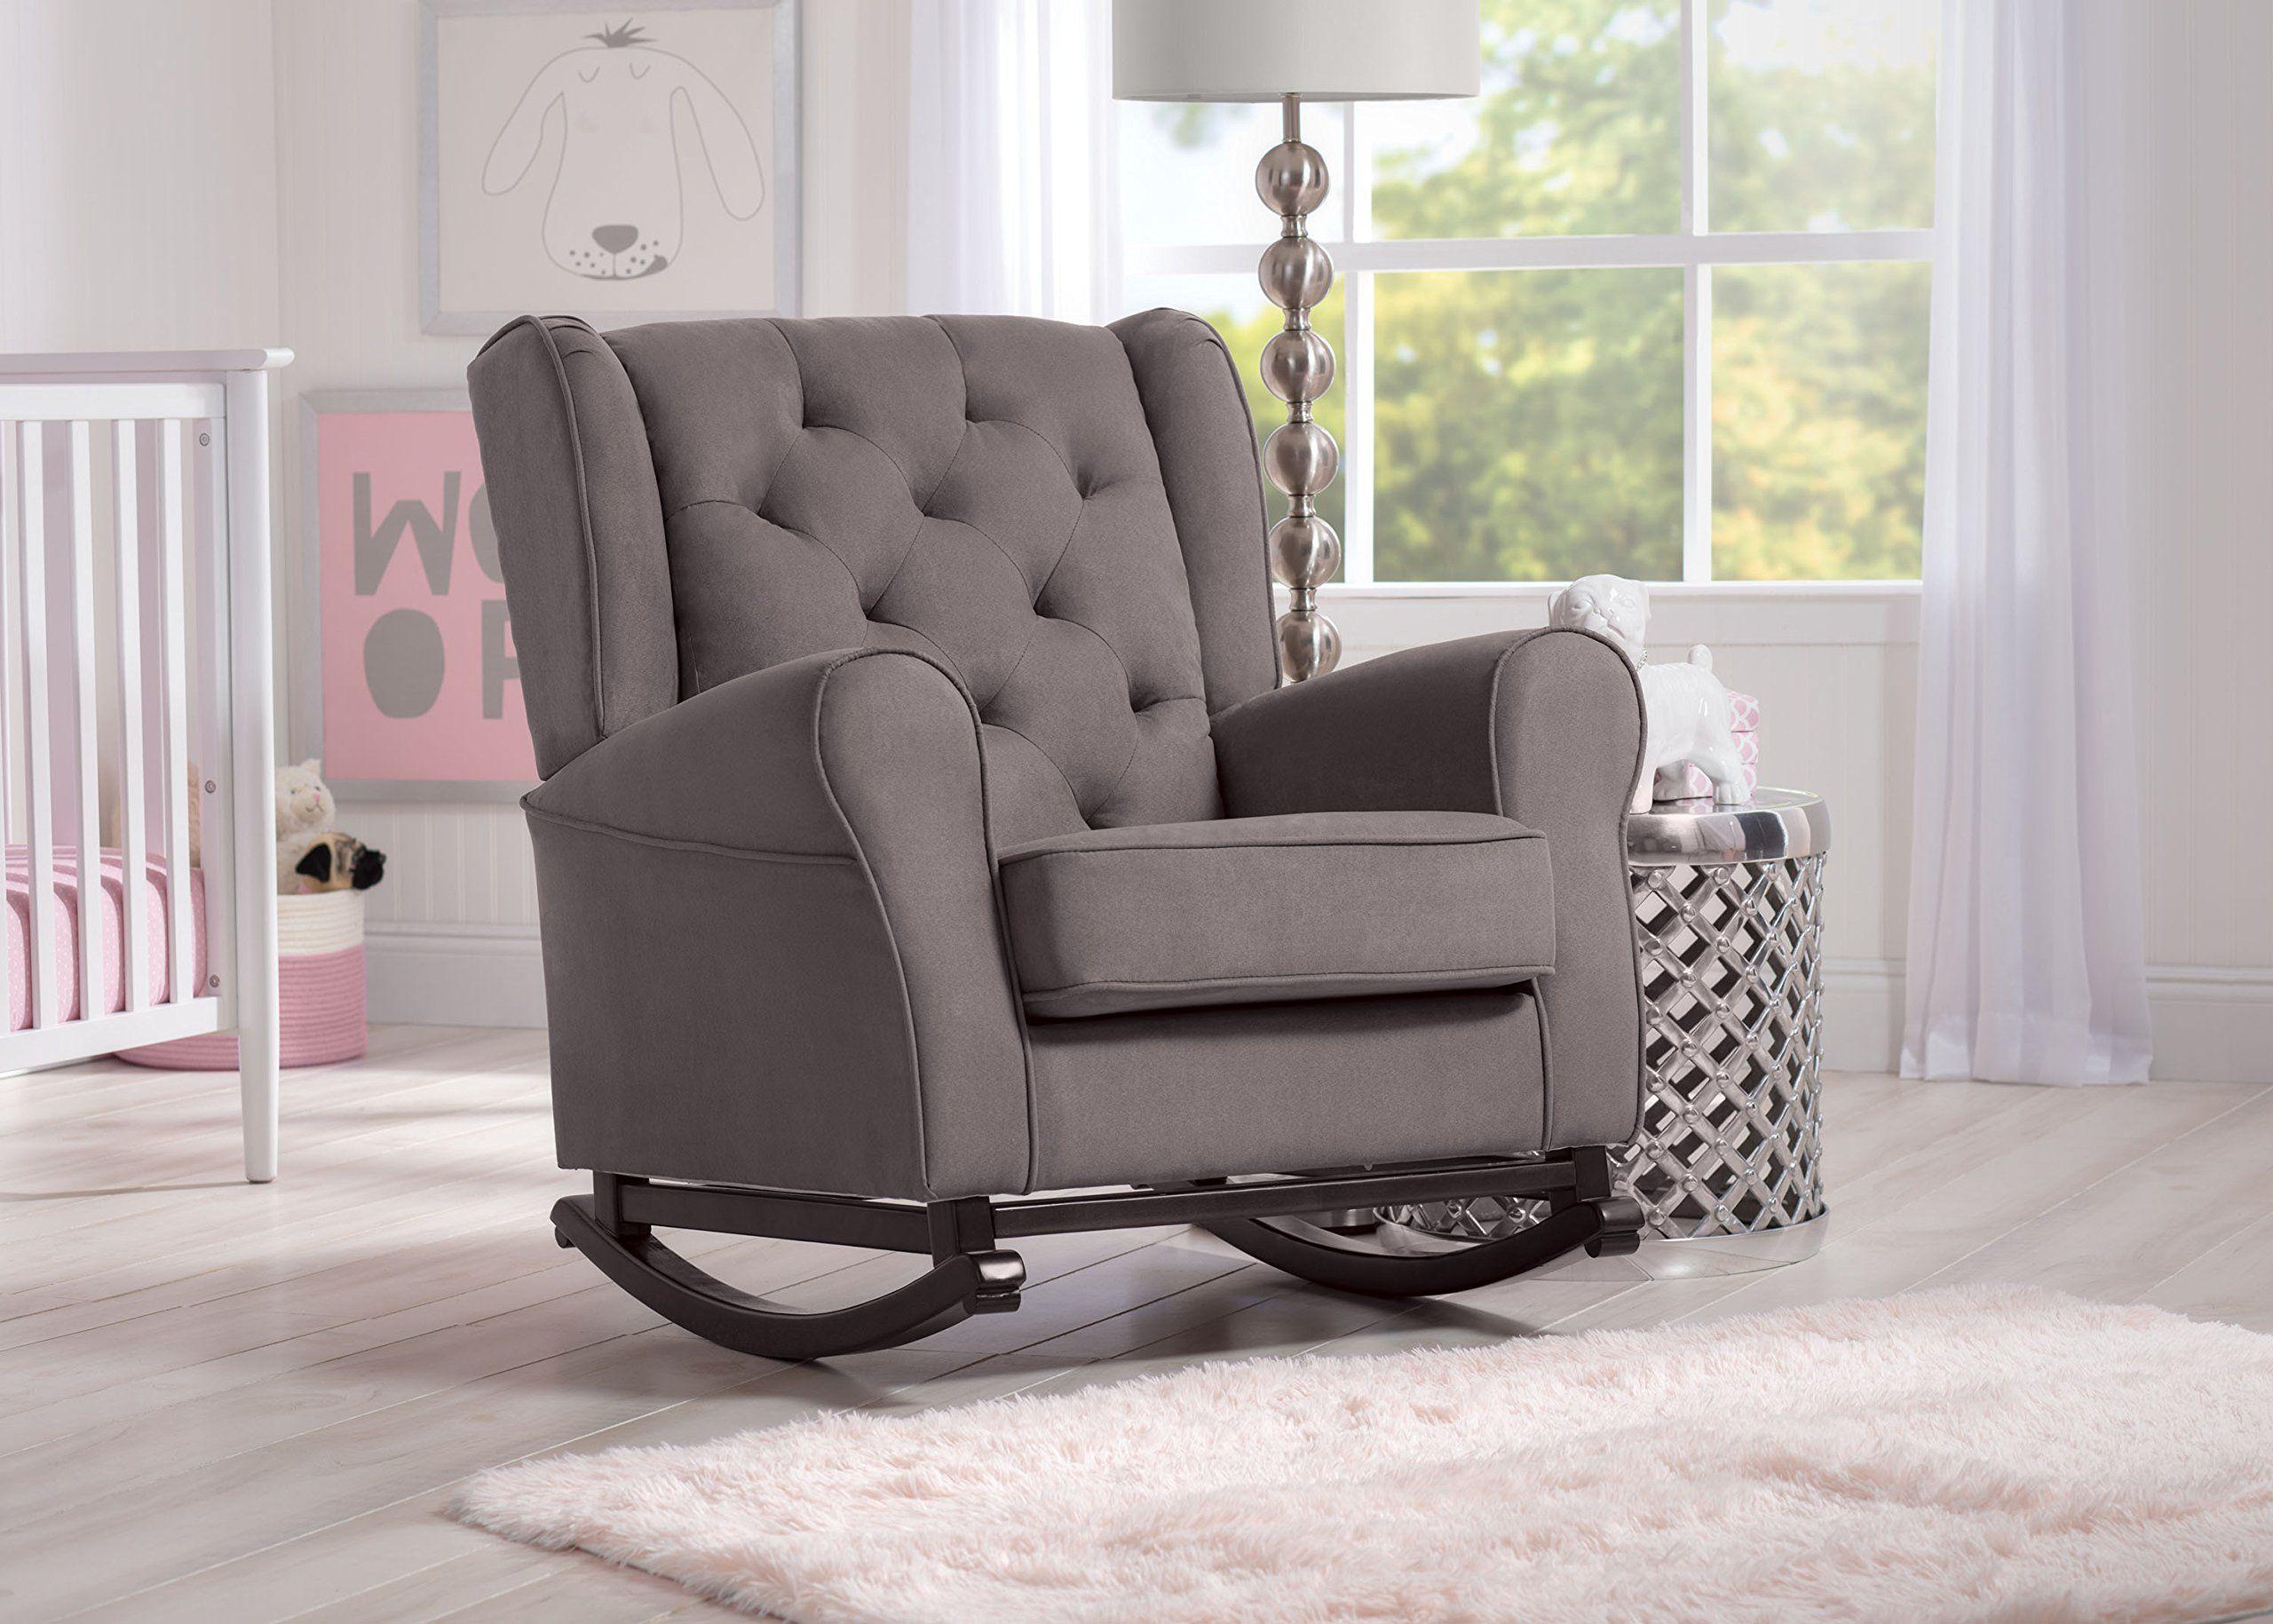 Delta Furniture Emma Upholstered Rocking Chair Graphite